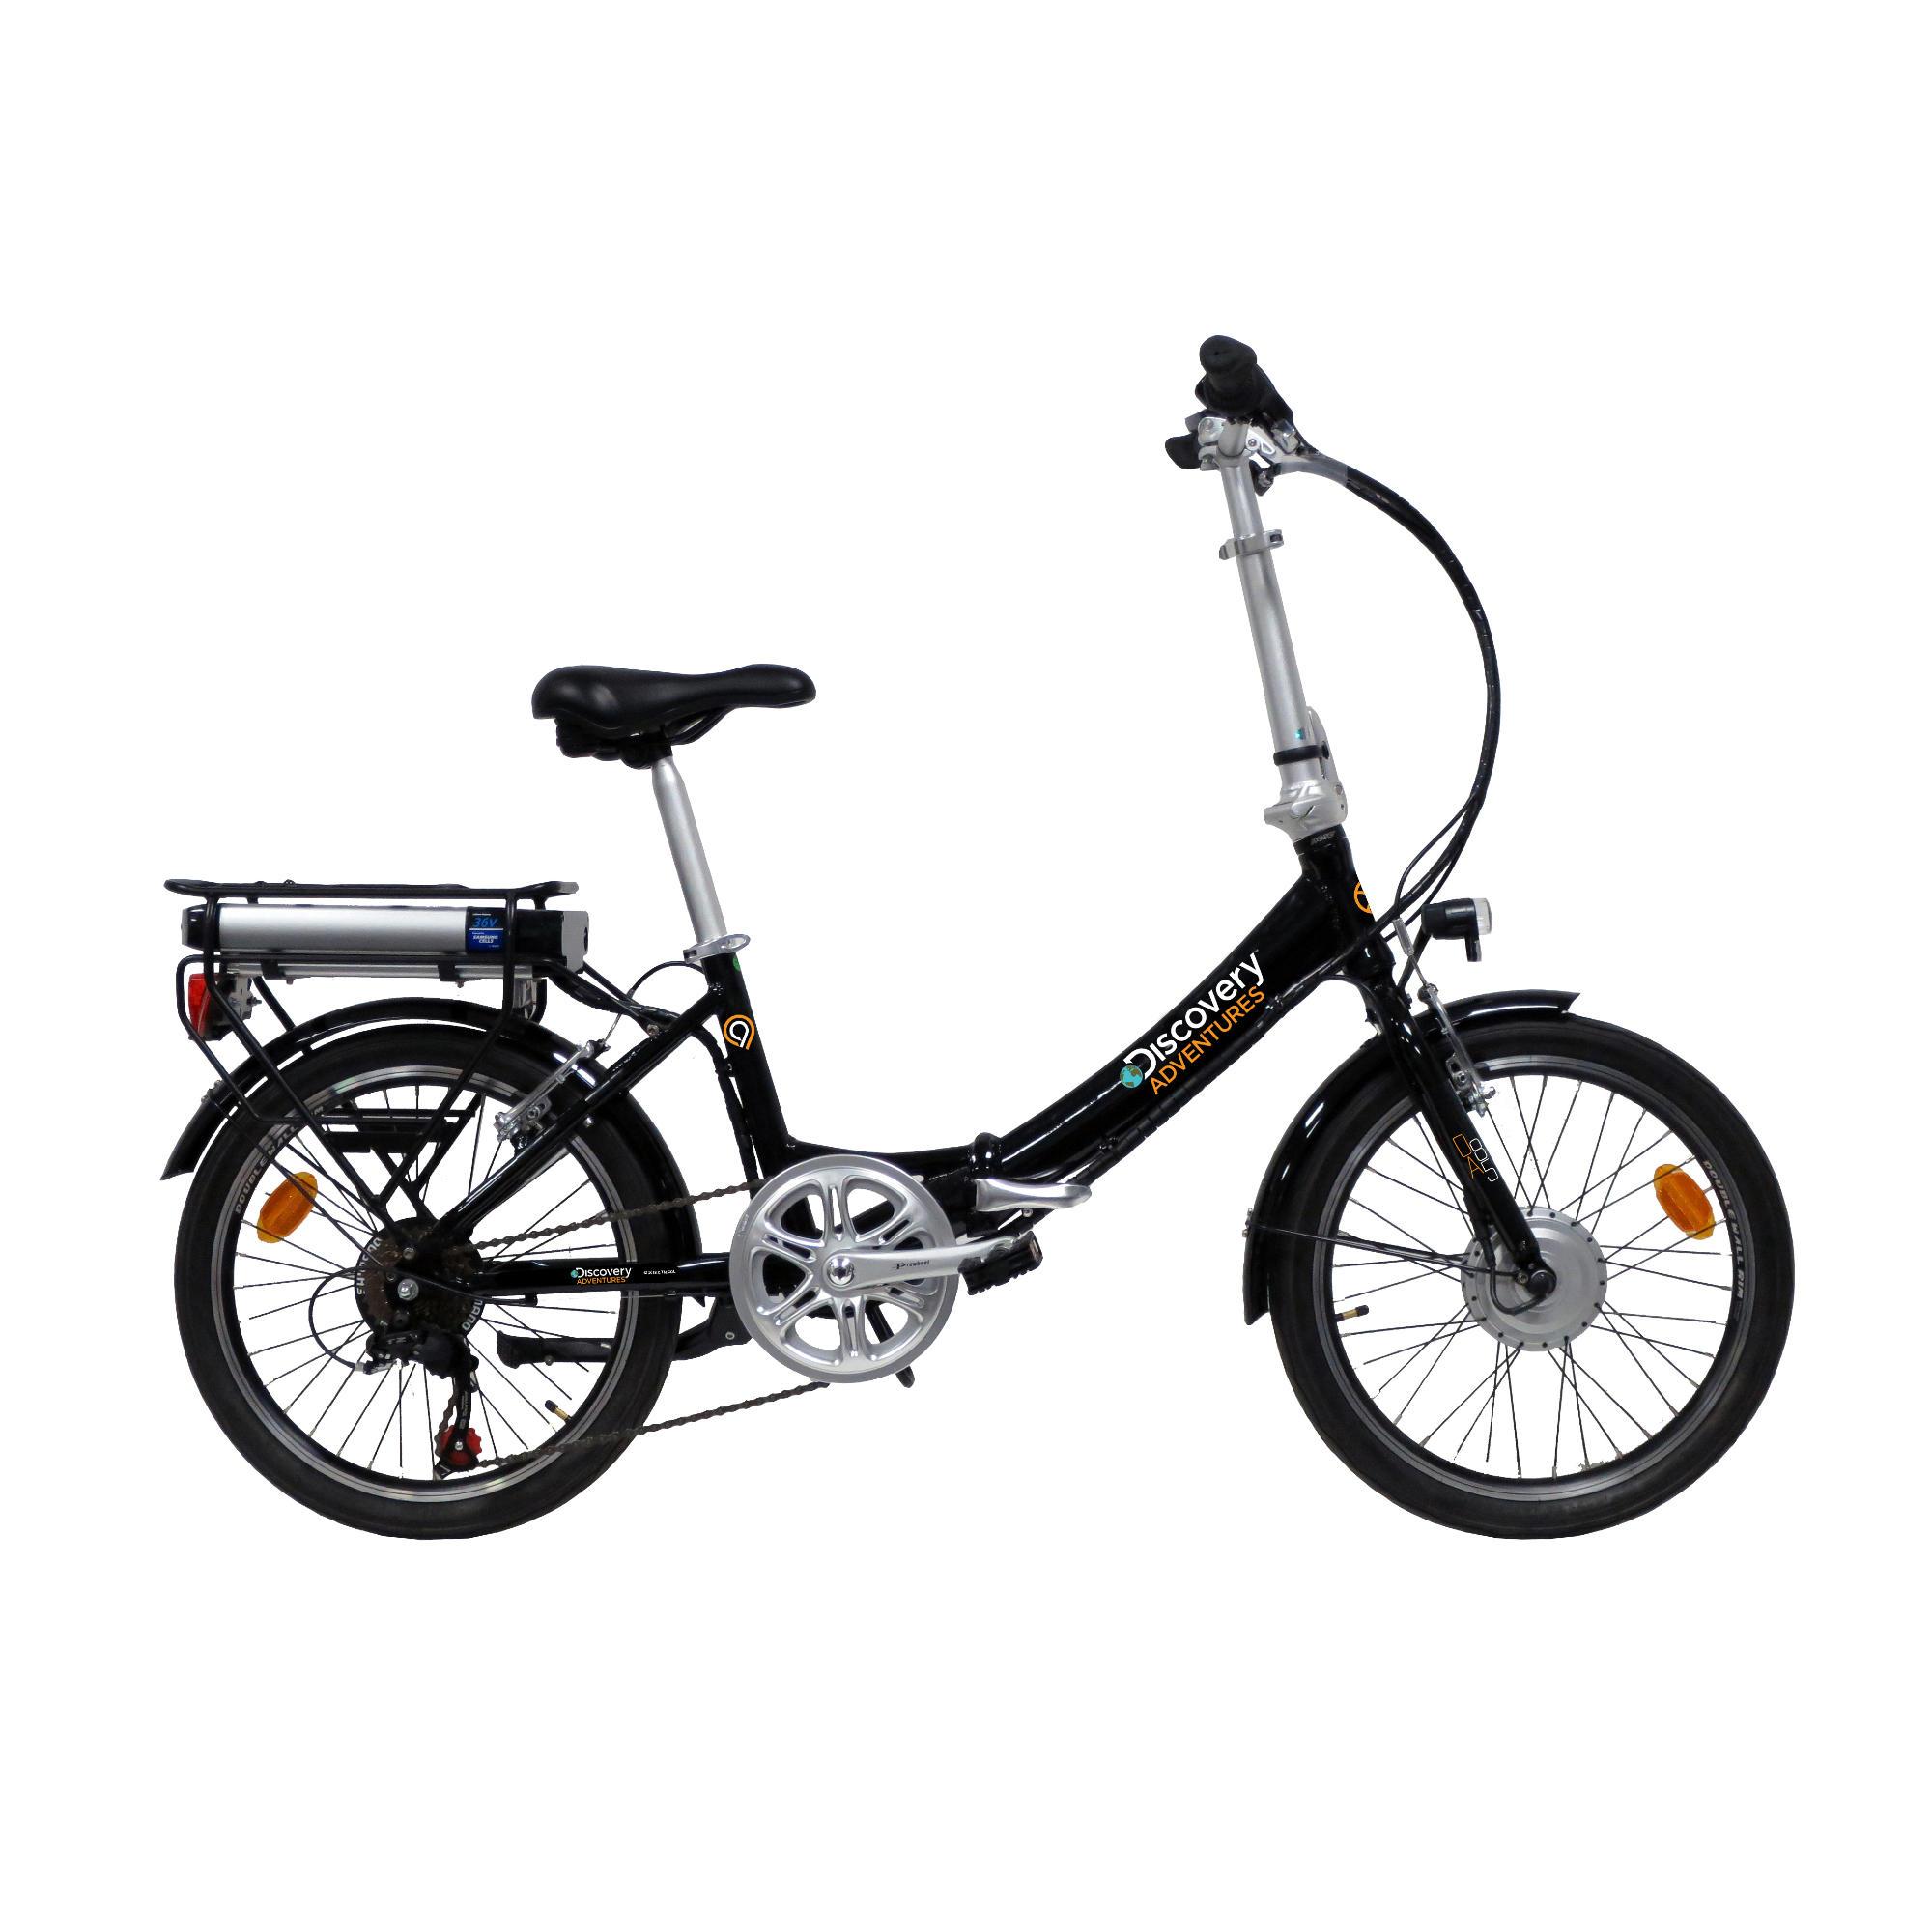 Bicicleta eléctrica plegable Discovery Adventures E2000